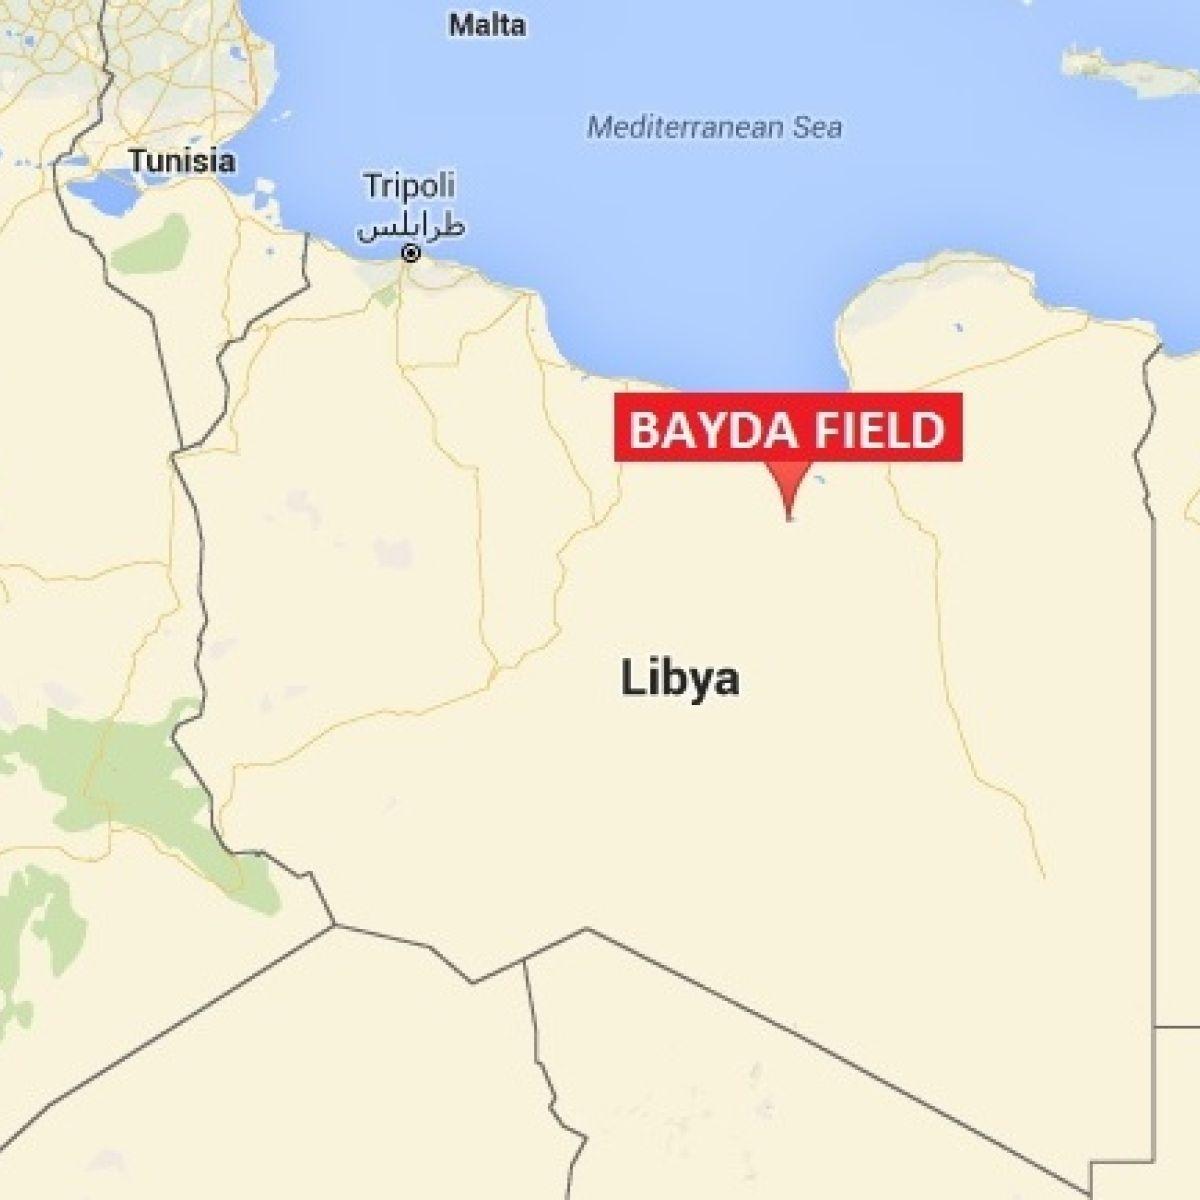 libya bo sung san luong 10000 thungngay tu ba mo nho o phia dong